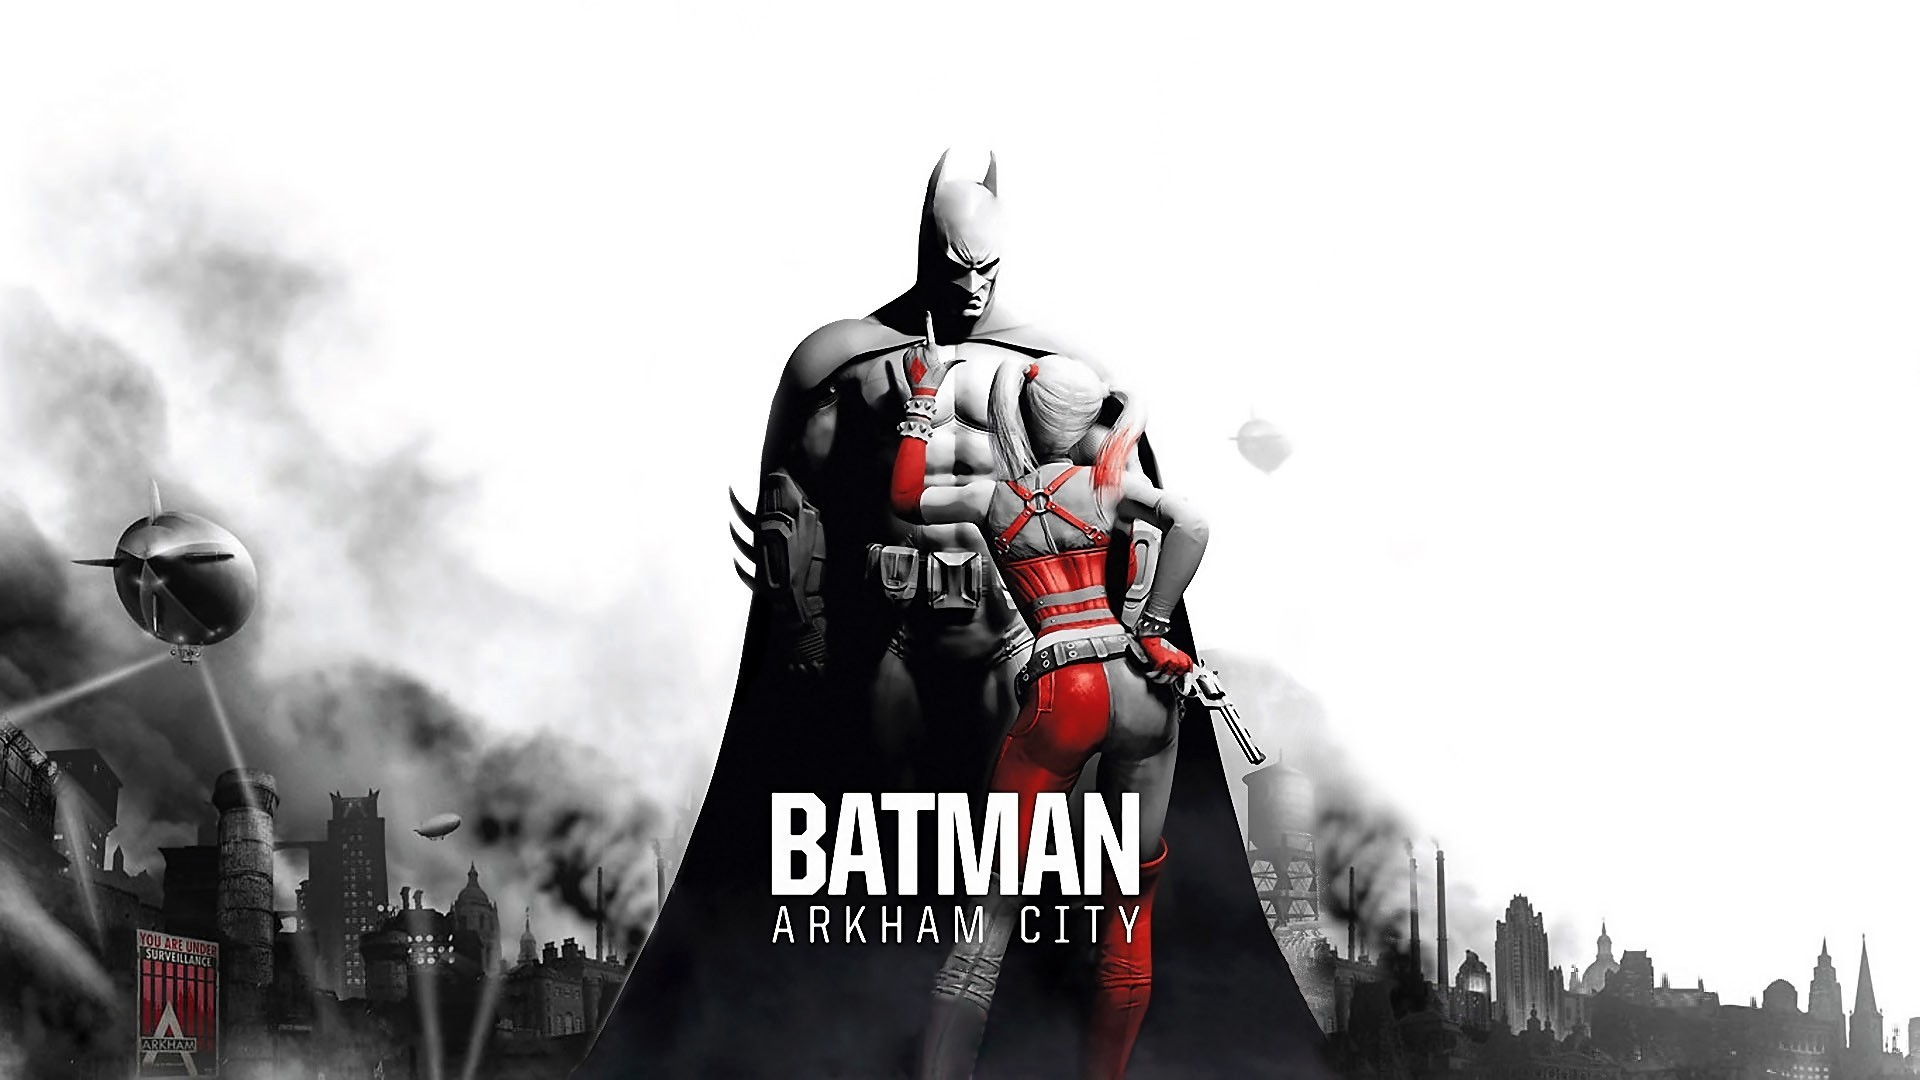 Cool Wallpapers Batman Arkham City HD Wallpaper